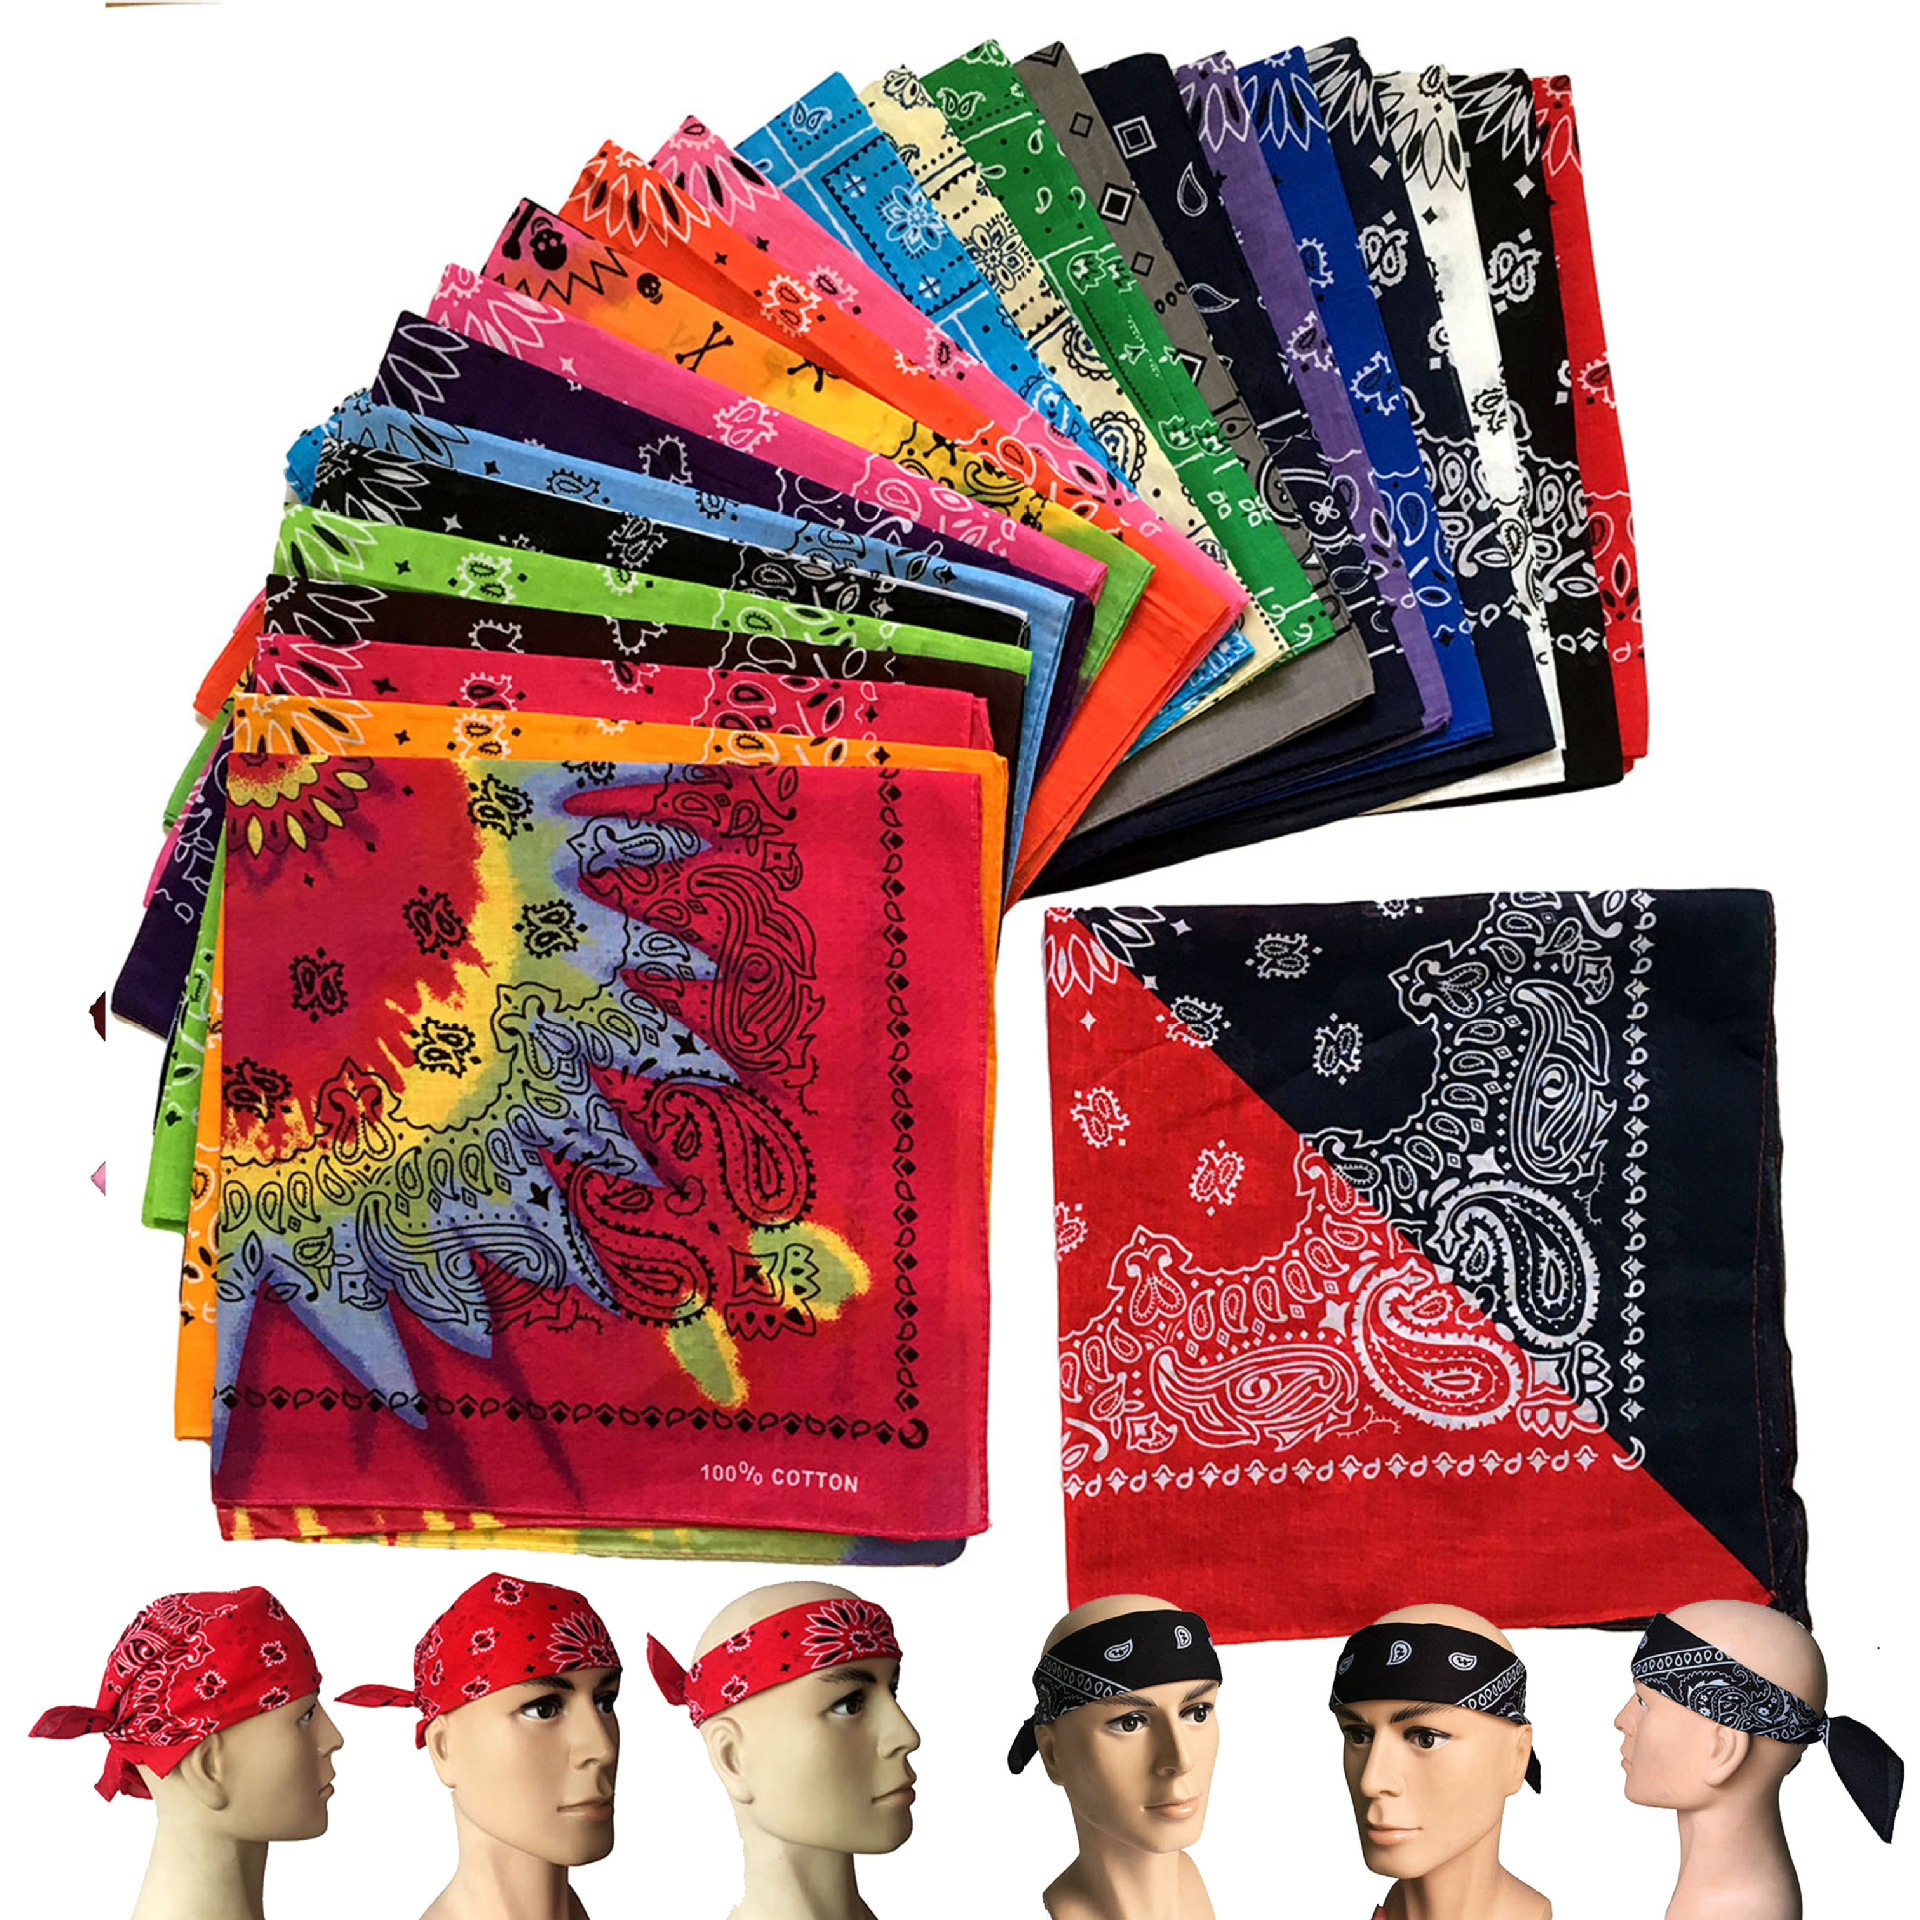 New Cotton Unisex Hip Hop Black Red Bandana Fashion Paisley Headwear Hair Band Neck Scarf Square Scarves Handkerchief